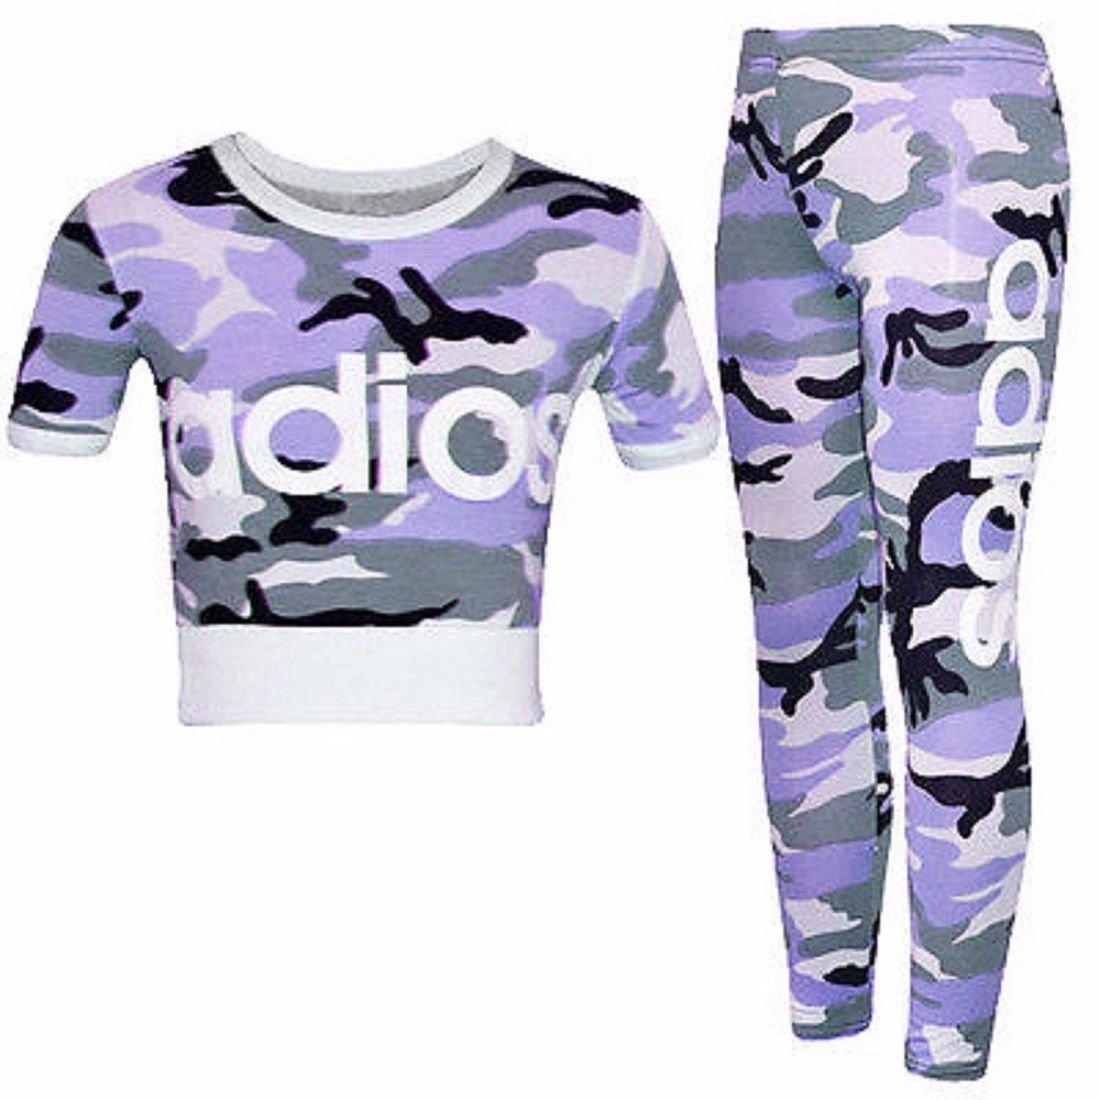 Girls Camouflage Crop Top Kids Camo Short Sleeve Tops Tee T-Shirts New 7-13 Year